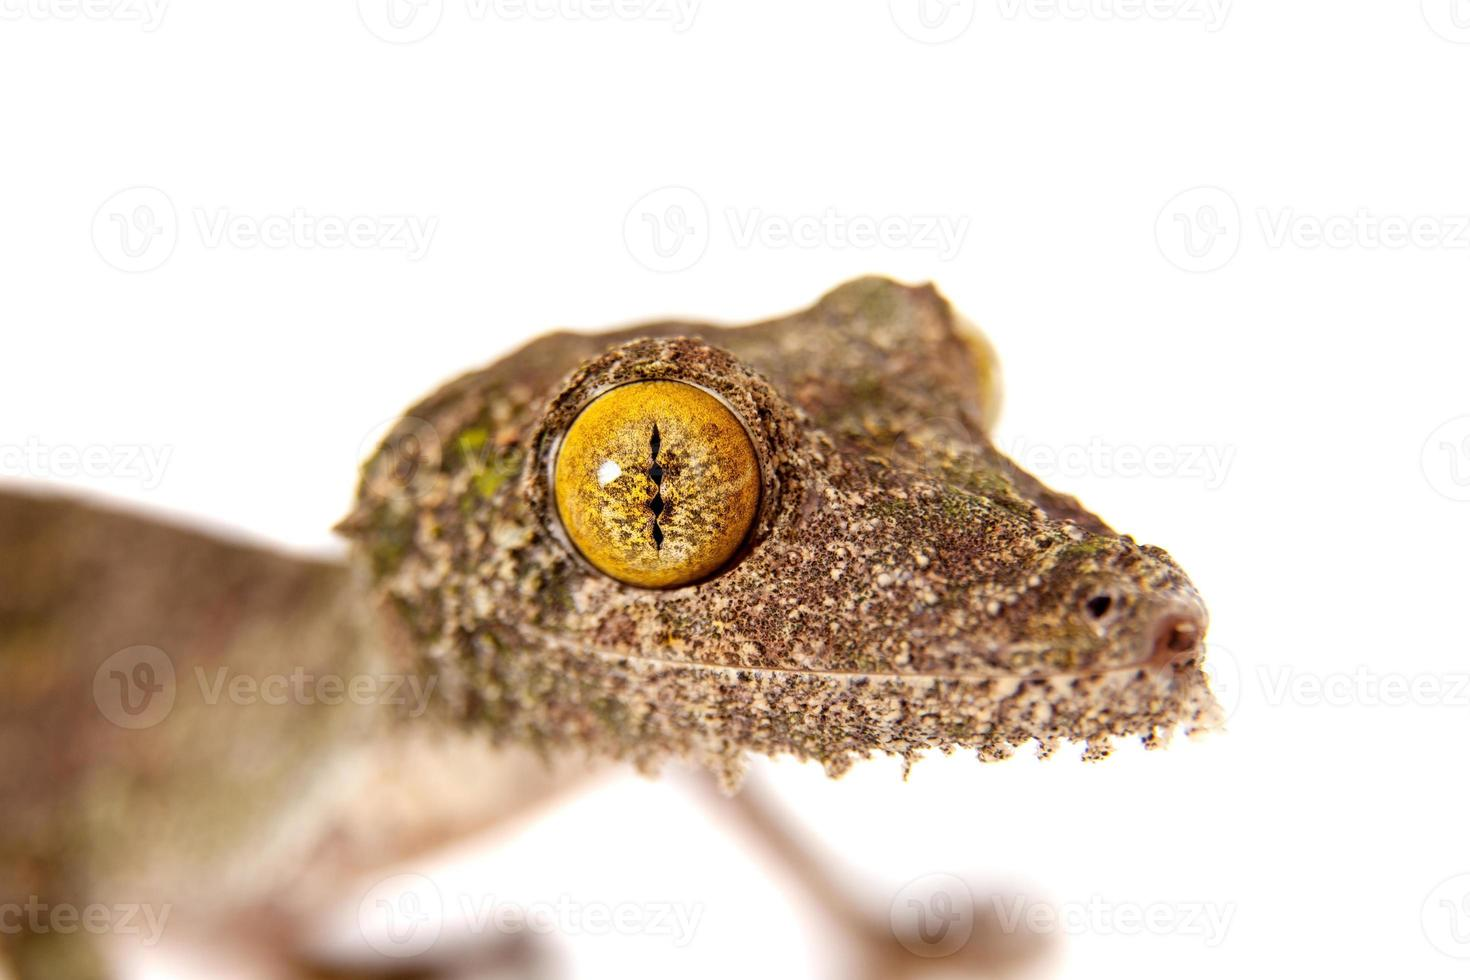 Leaf-tailed Gecko, uroplatus sameiti on white photo